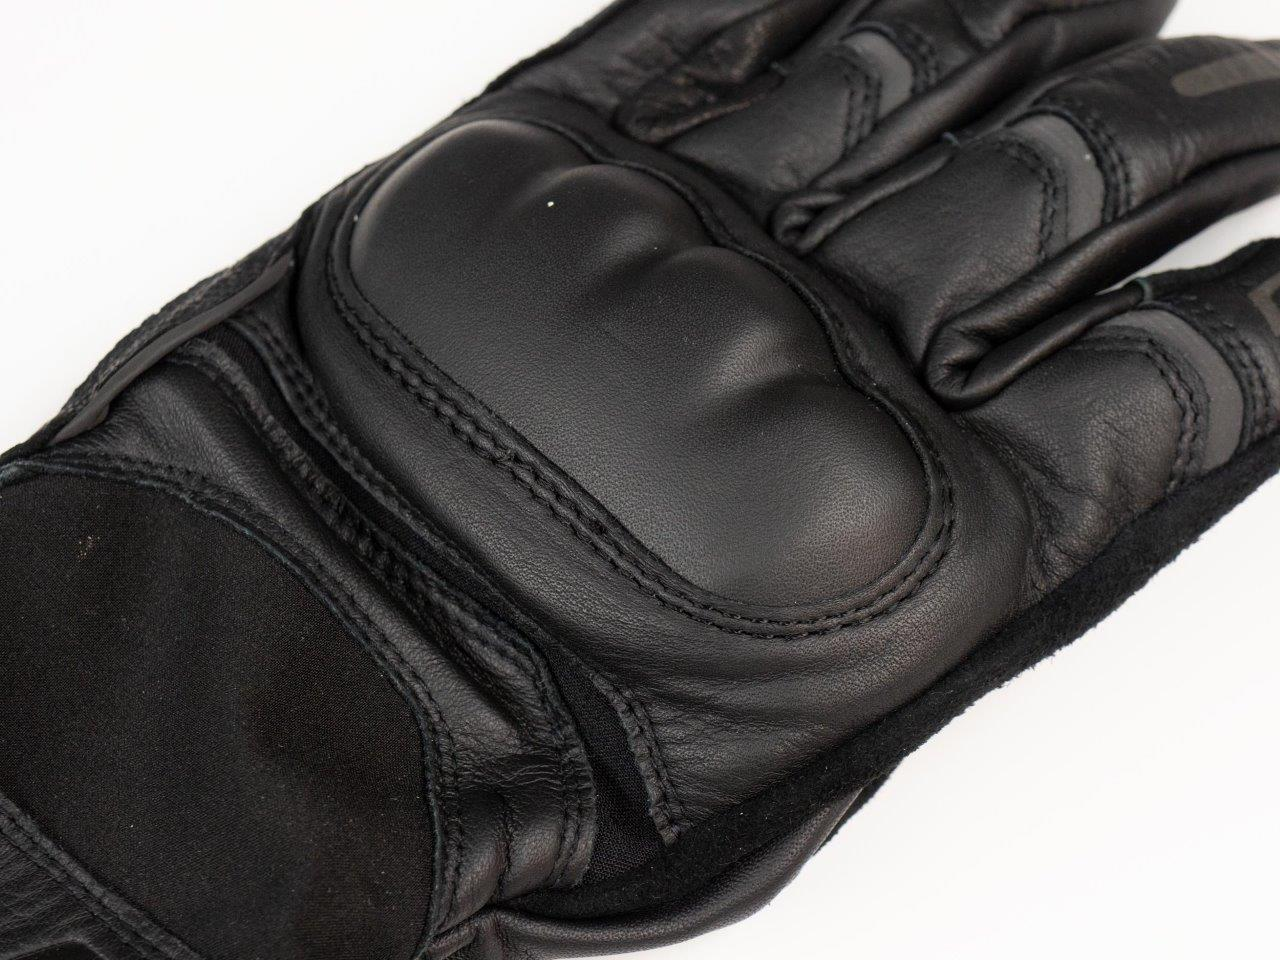 REAX Ridge Waterproof Gloves Knuckle Closeup